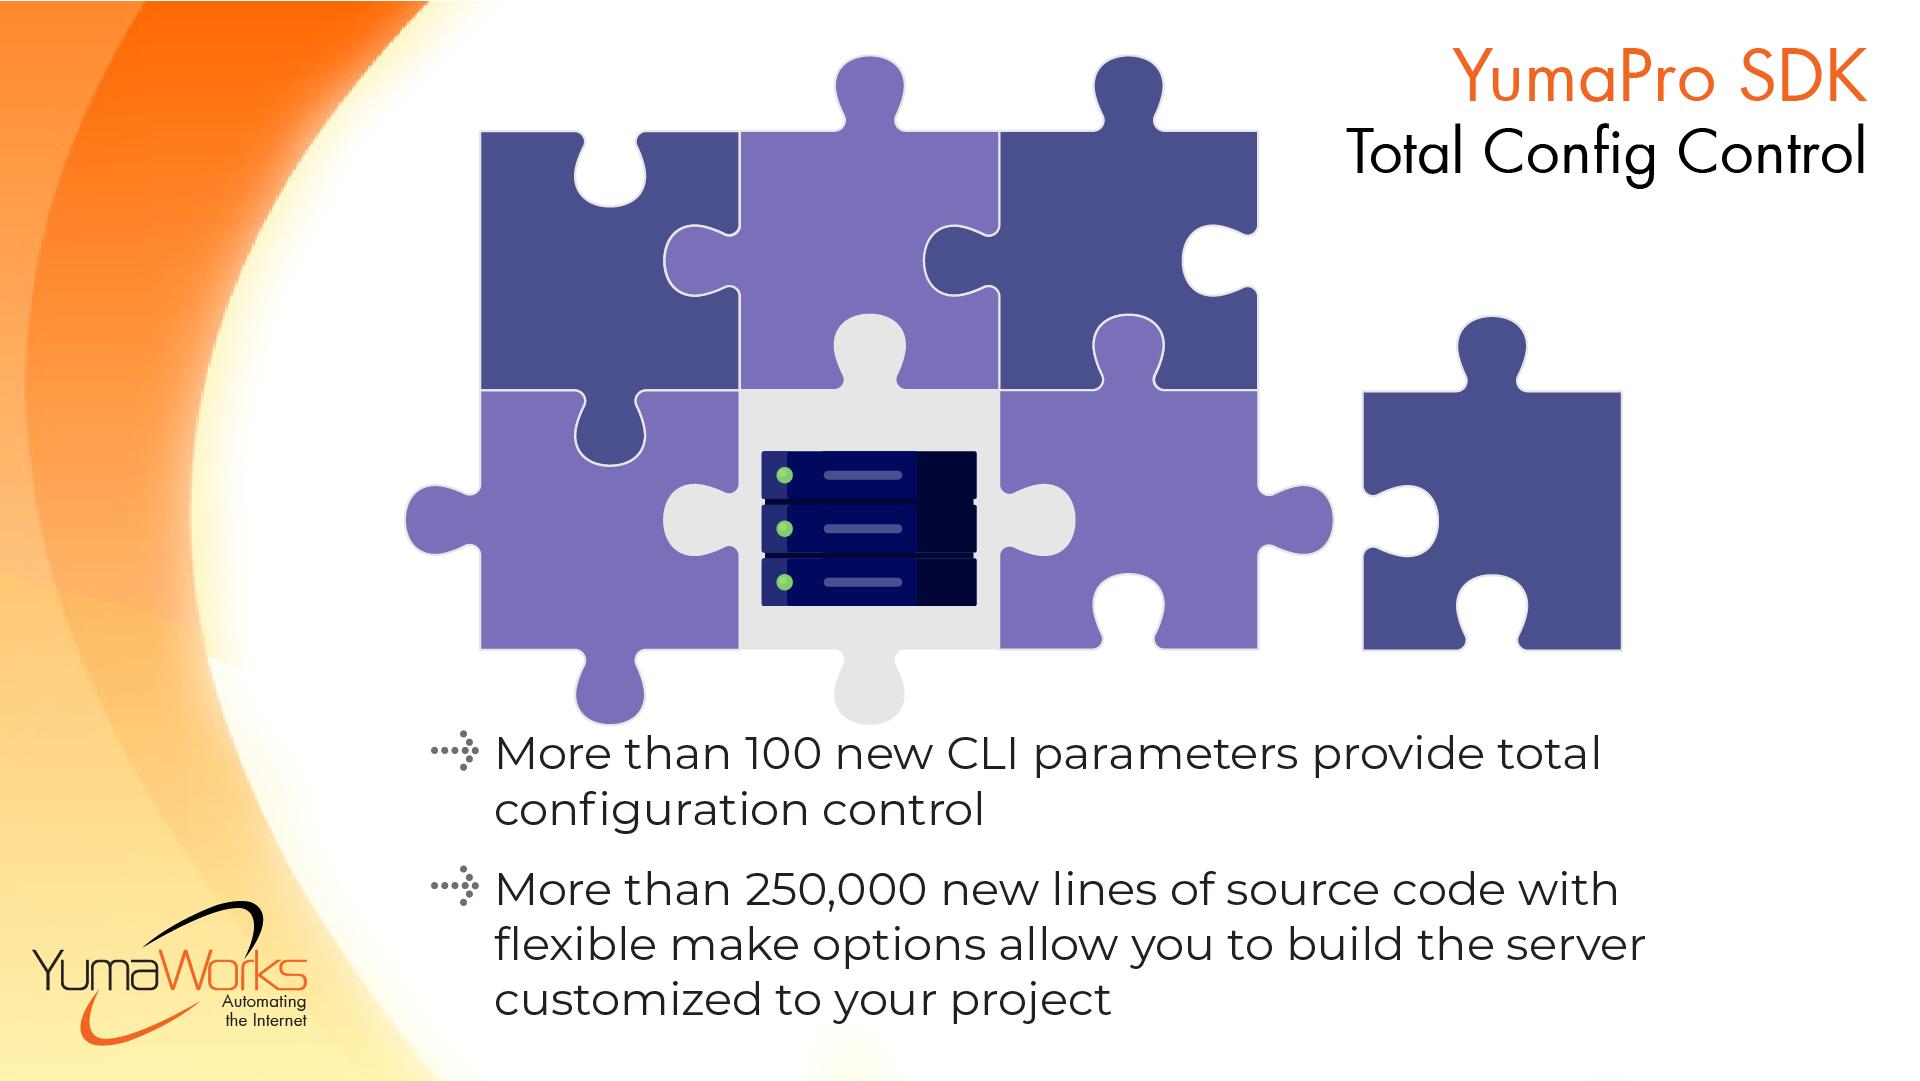 YumaPro SDK provides total configuration control